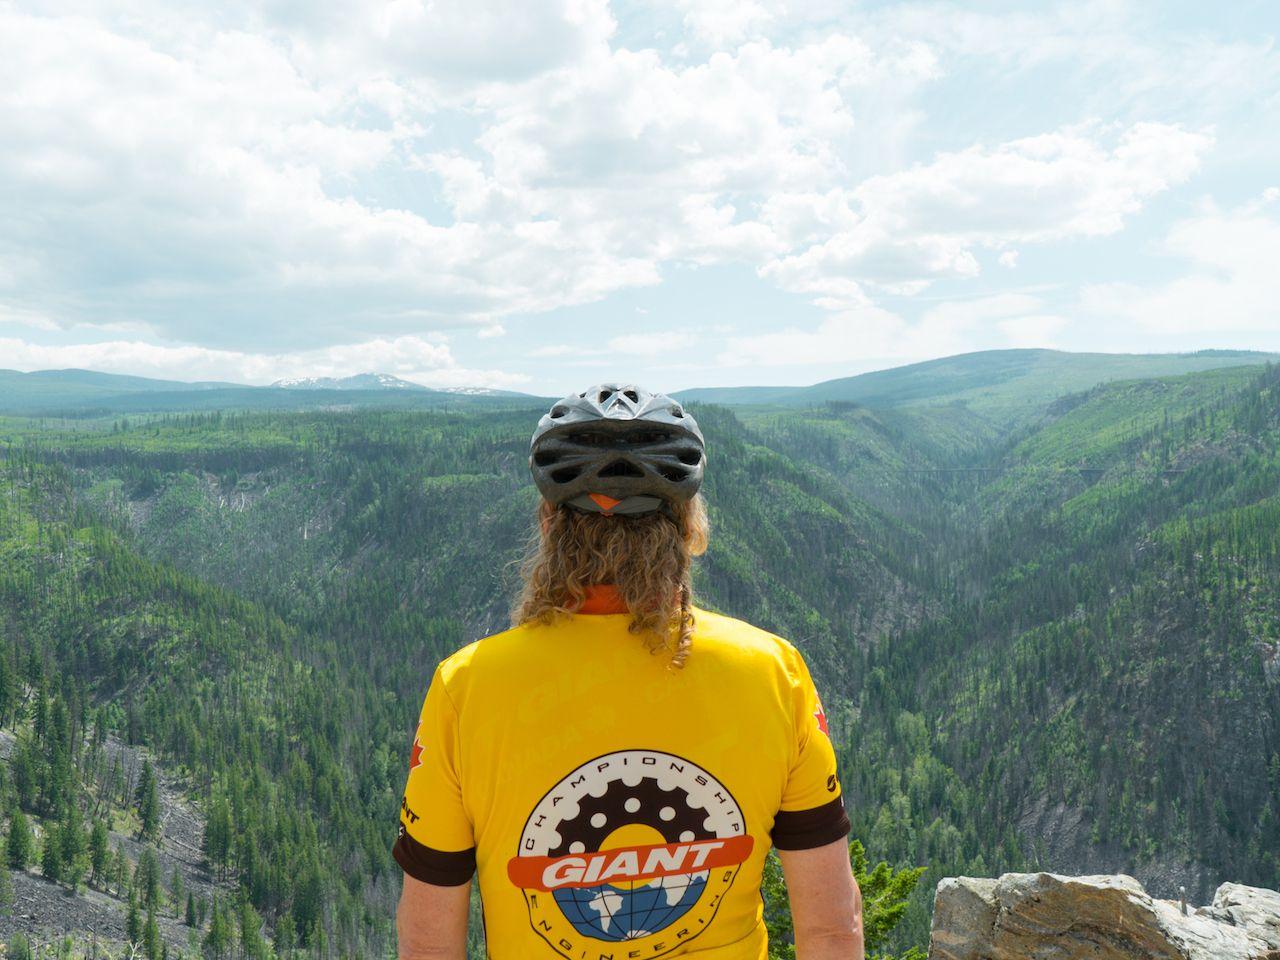 Visiting British Columbia? Don't miss the Okanagan Valley